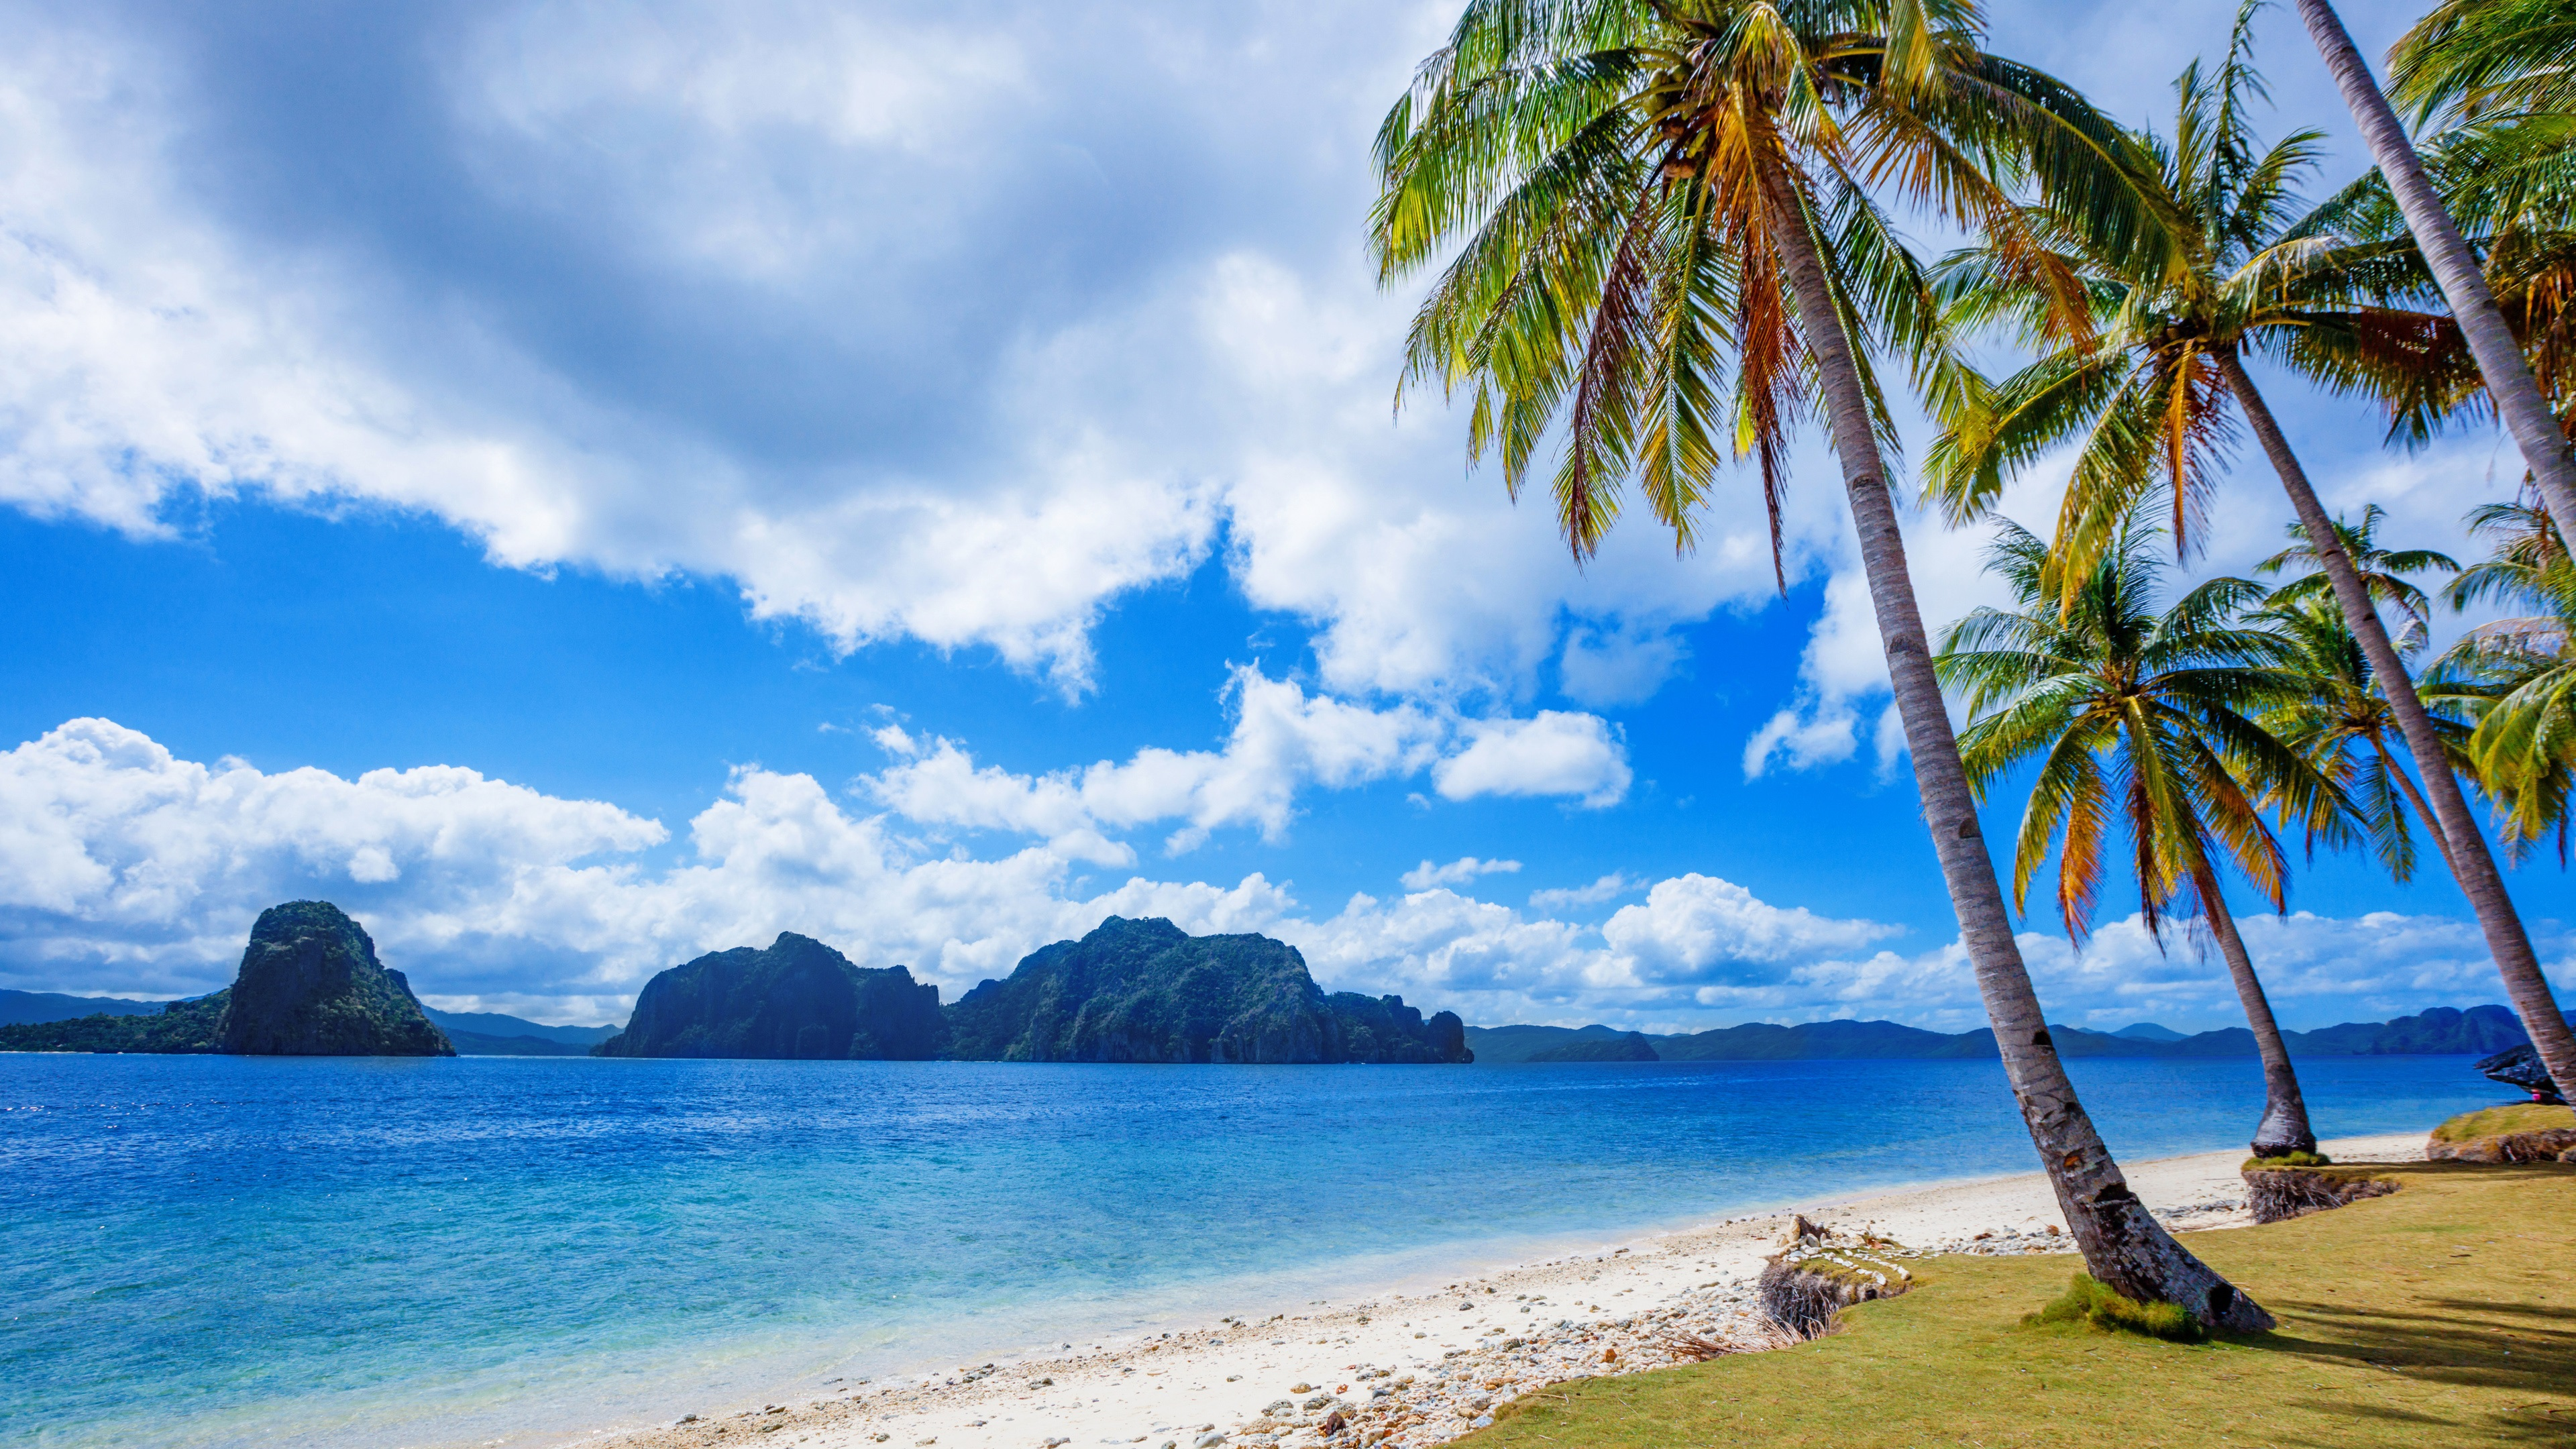 Wallpaper Philippines, Tropics, Palm Trees, Sea - Cloth Beach Wedding Backdrop - HD Wallpaper